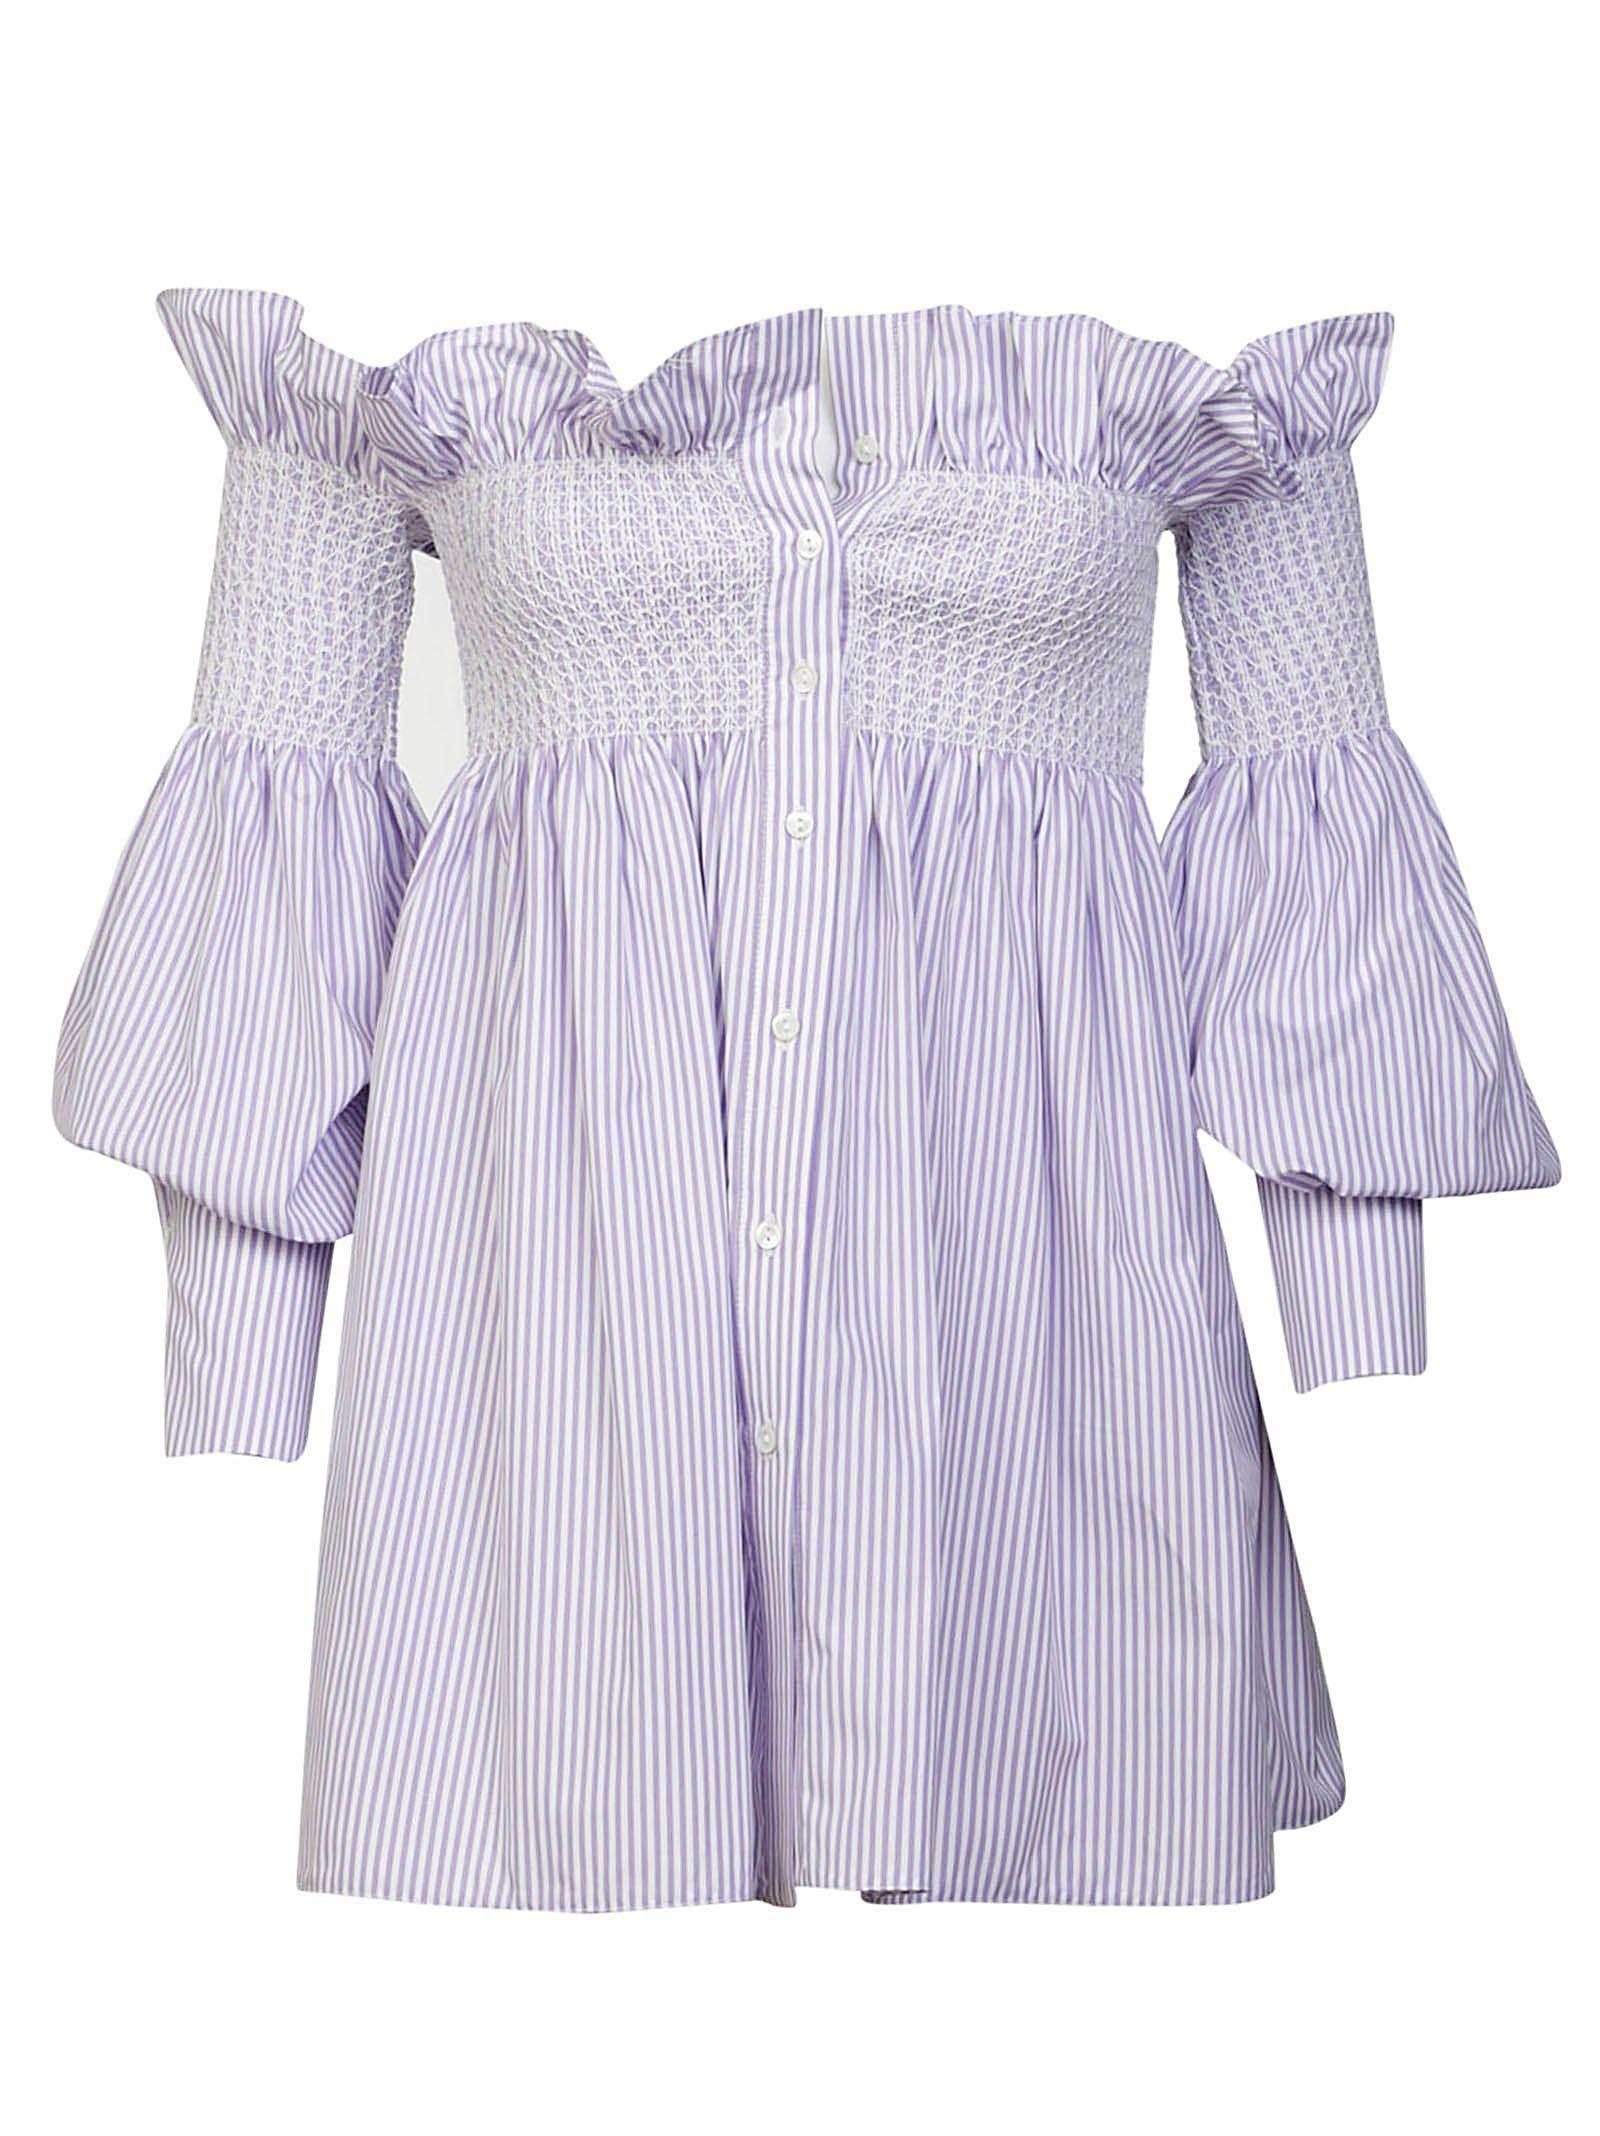 f48537727e33 ERIKA CAVALLINI STRIPED DRESS.  erikacavallini  cloth